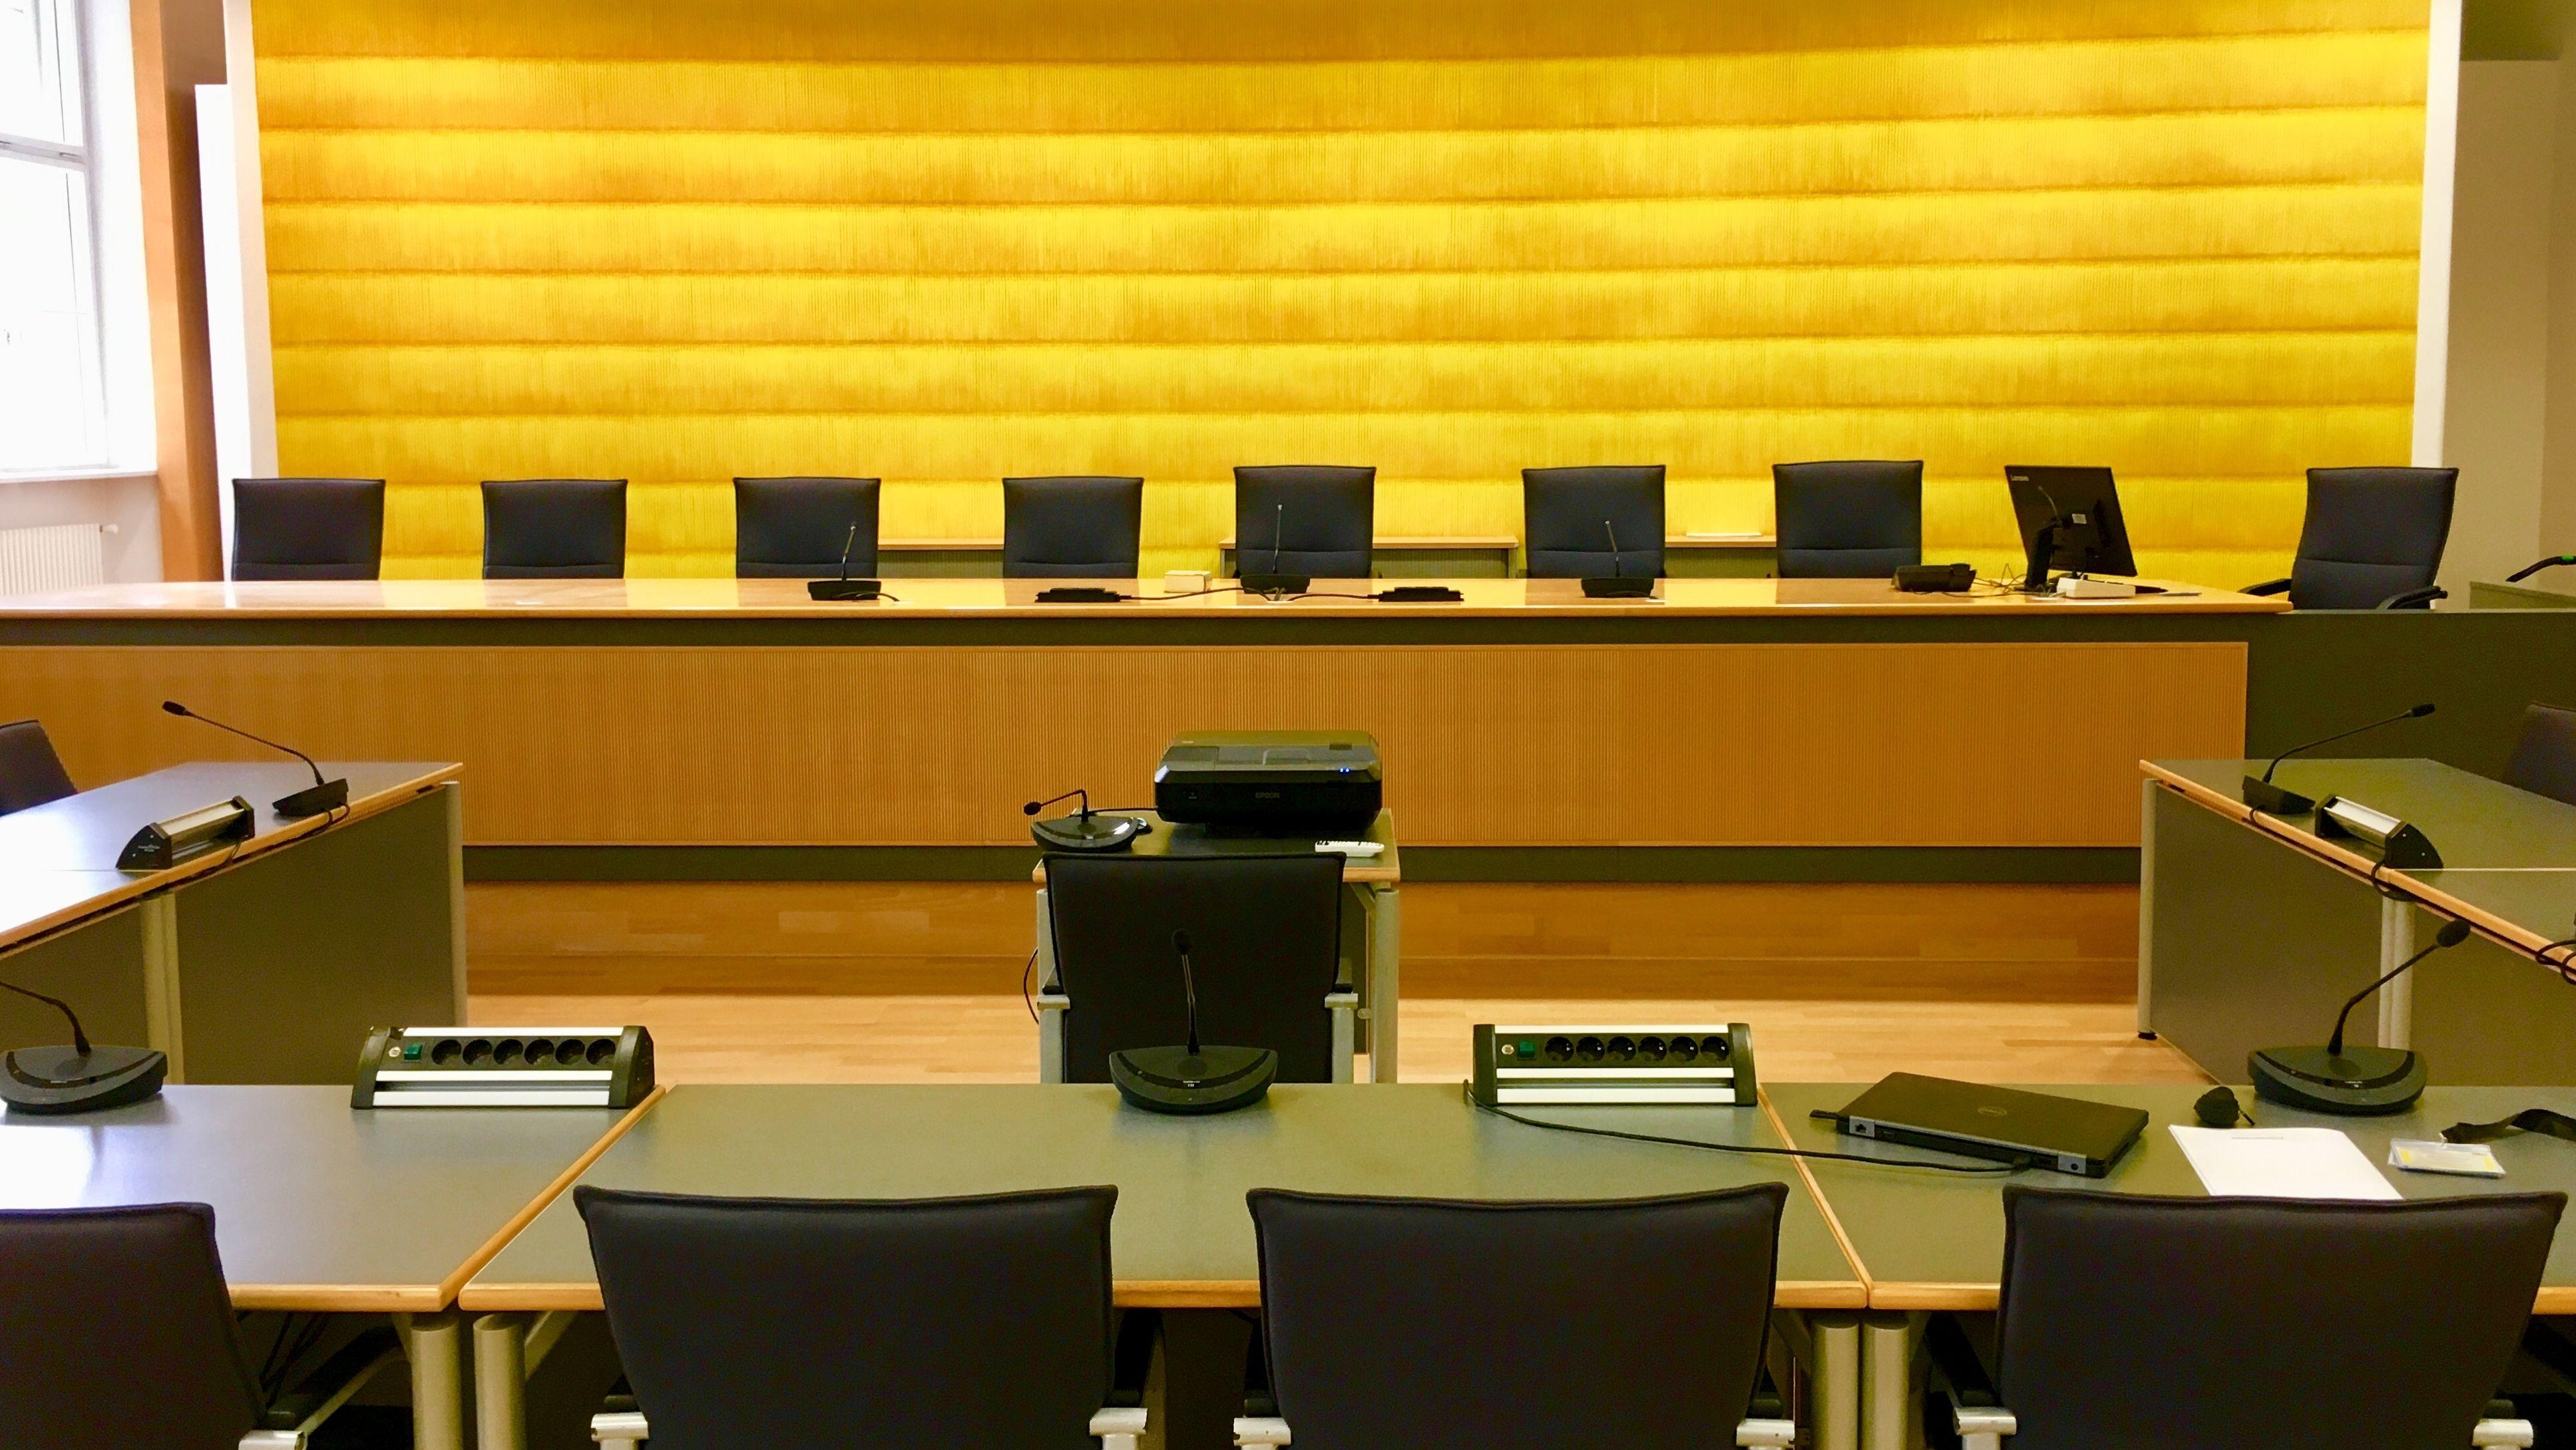 Saal 104 im Regensburger Landgericht